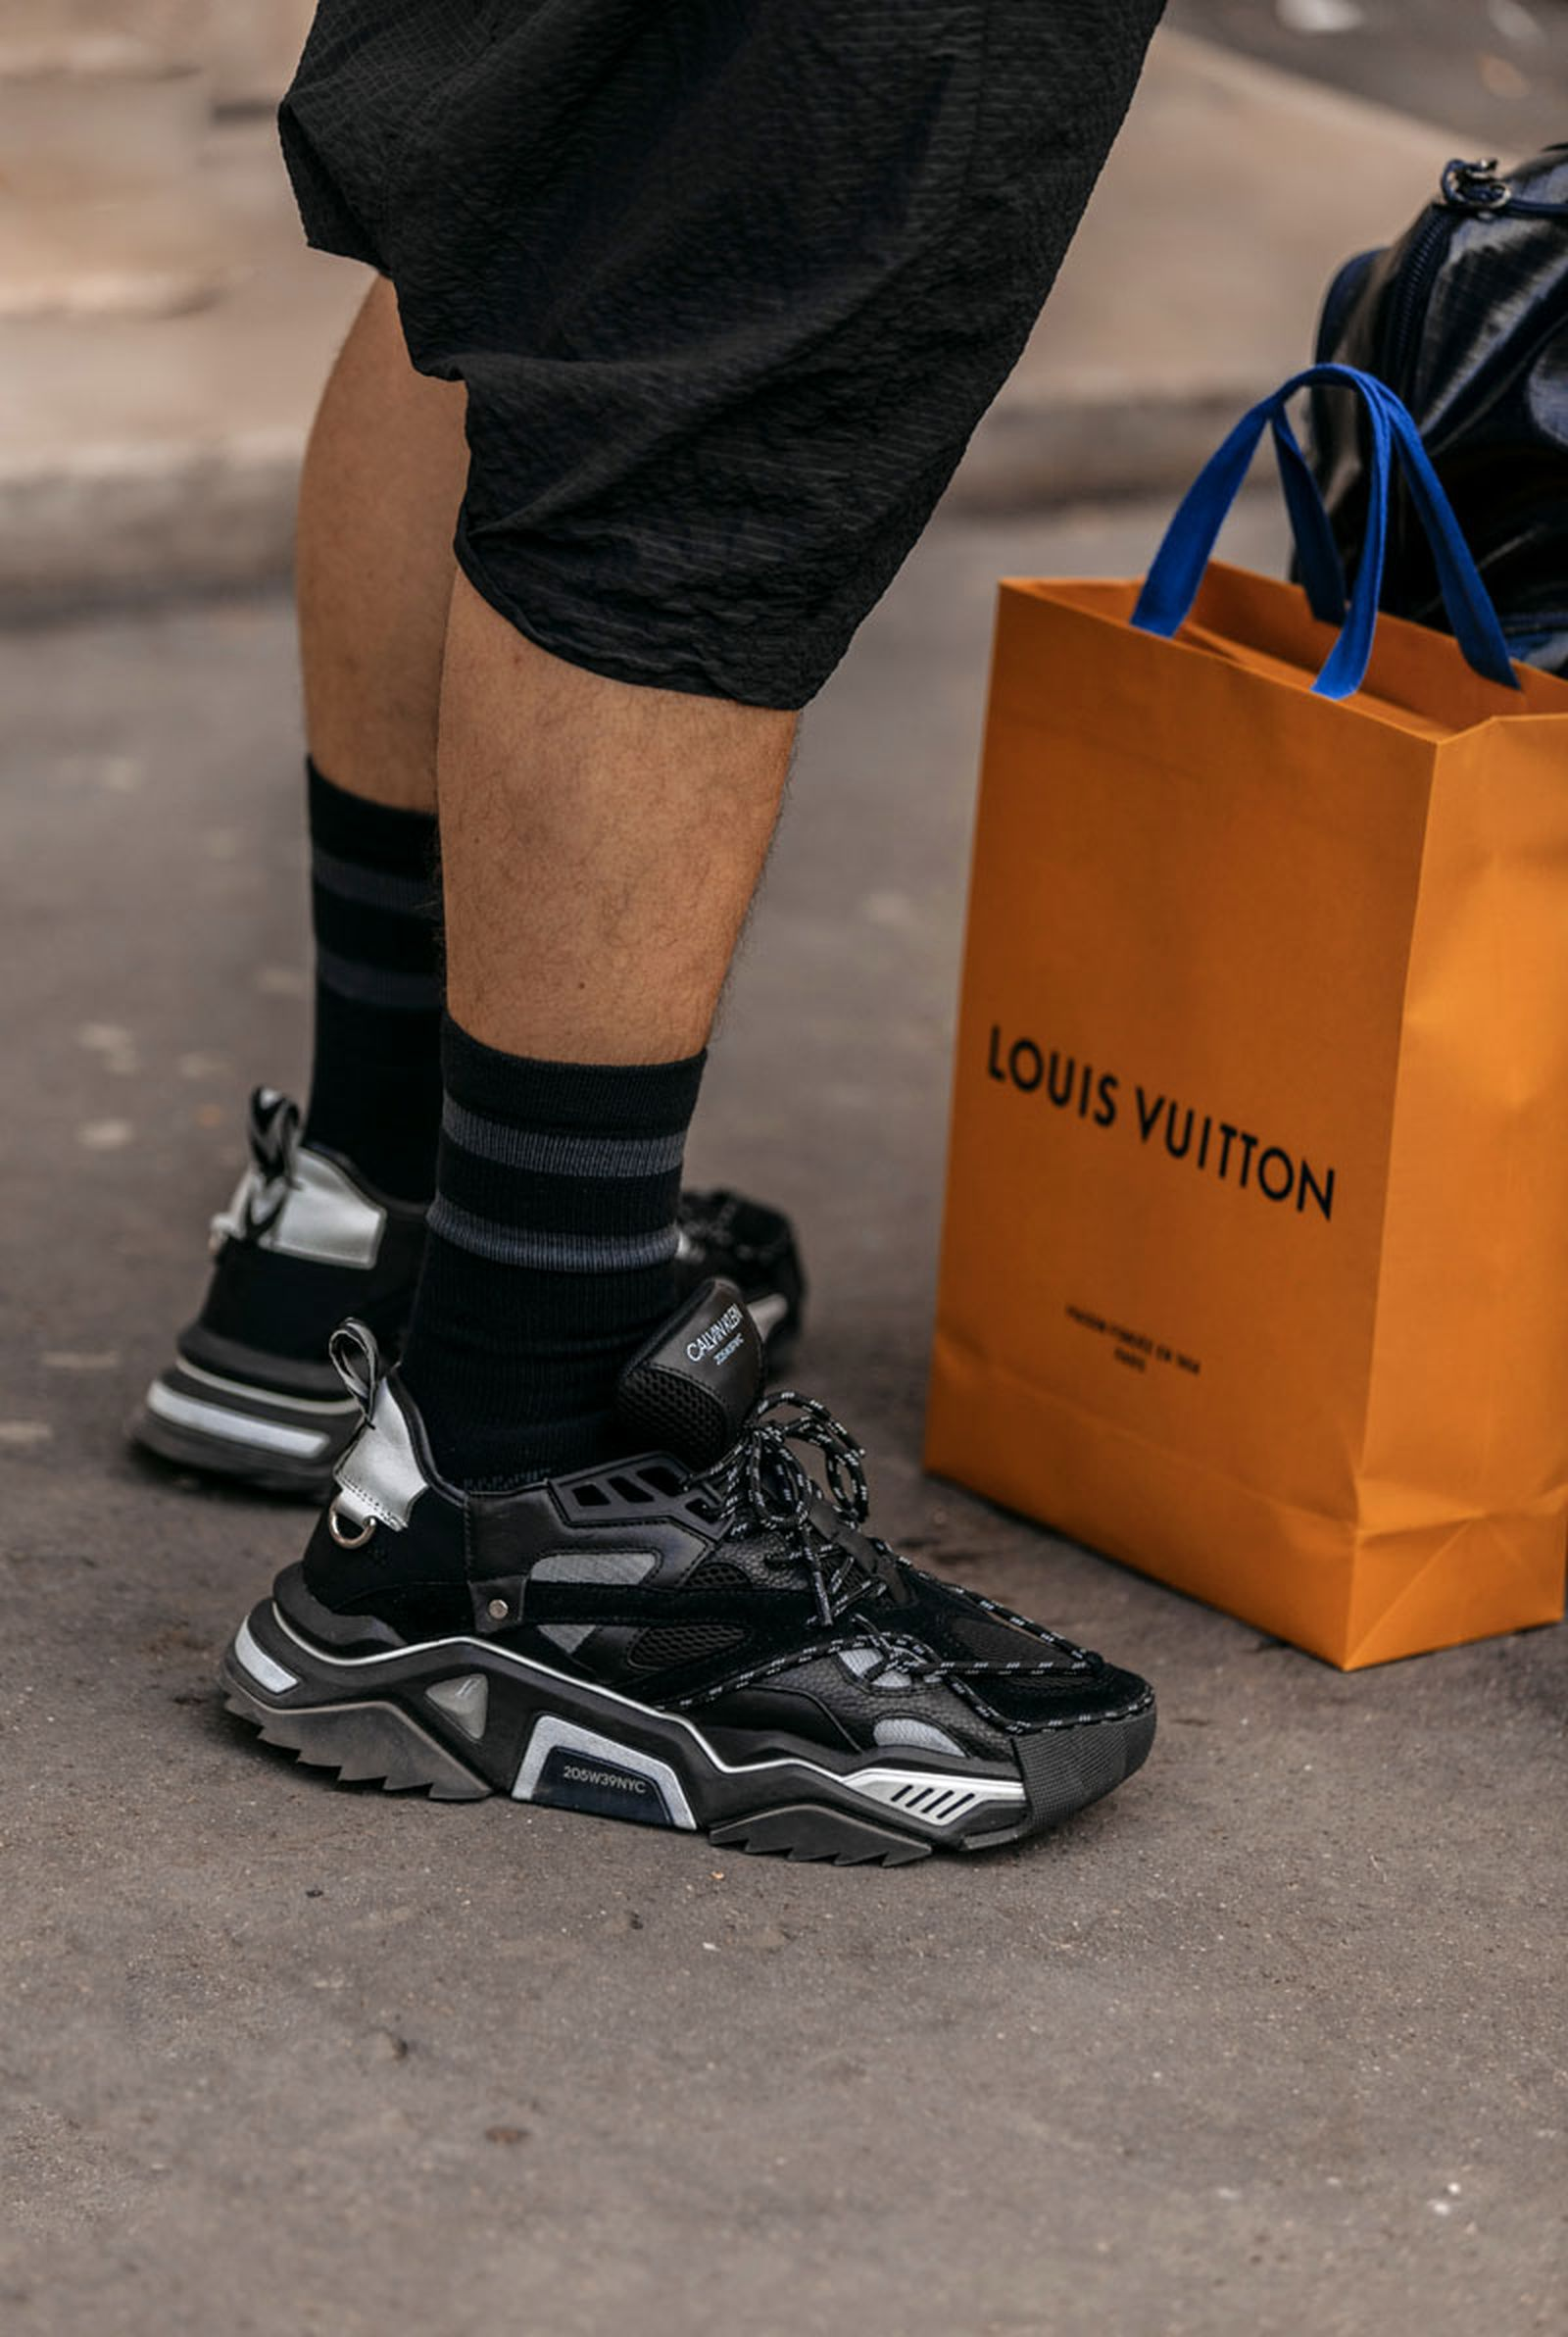 paris fashion week ss20 sneakers 020 Nike comme des garcons li ning